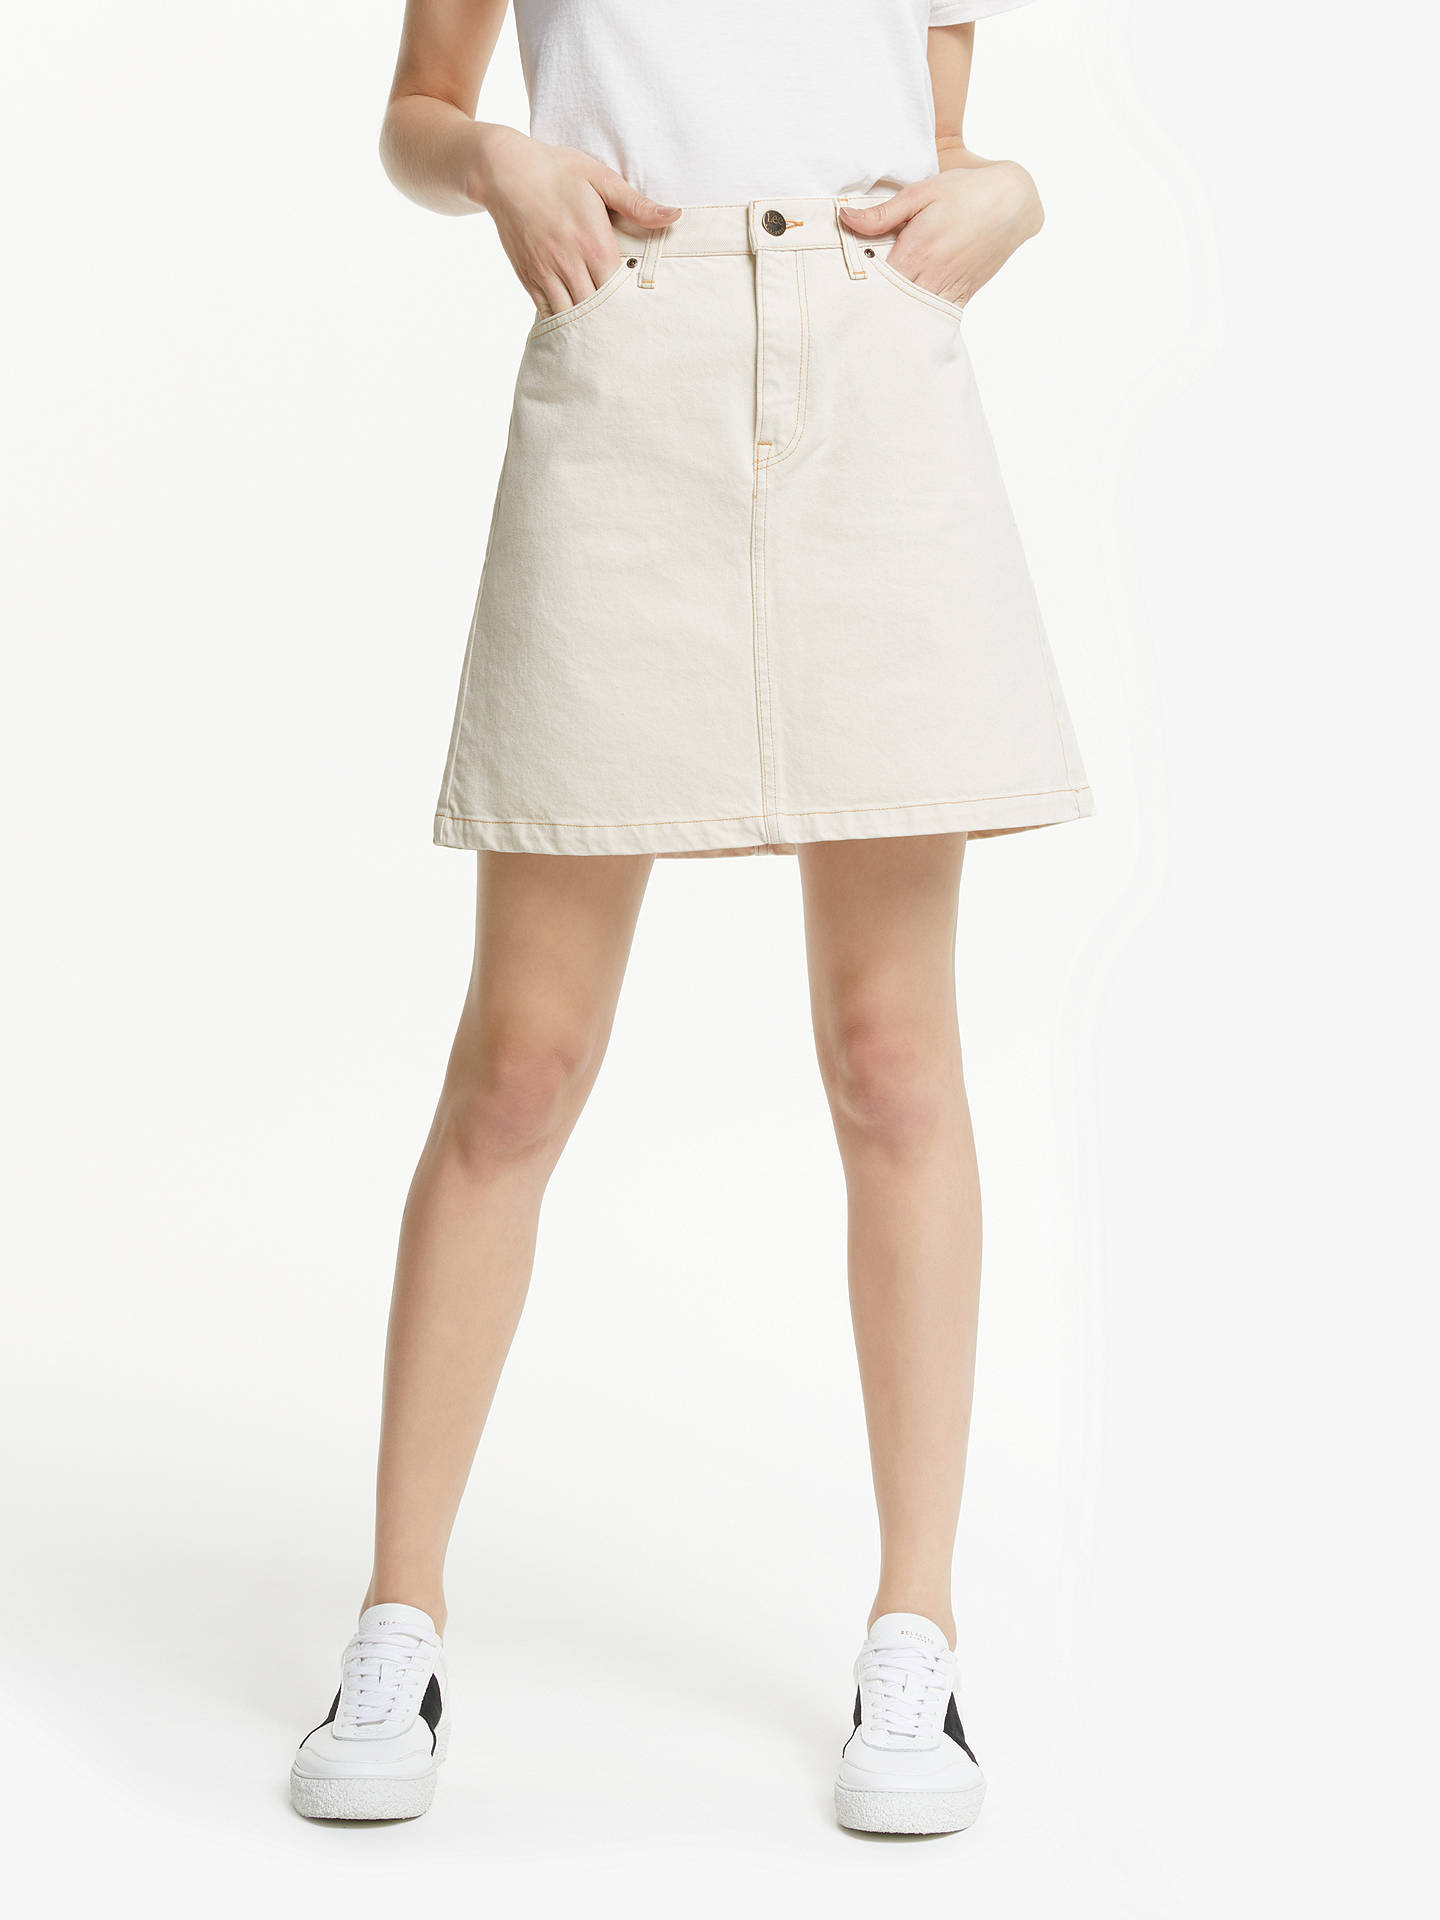 c078954111 Buy Lee A-Line Denim Skirt, Off White, 27 Online at johnlewis.